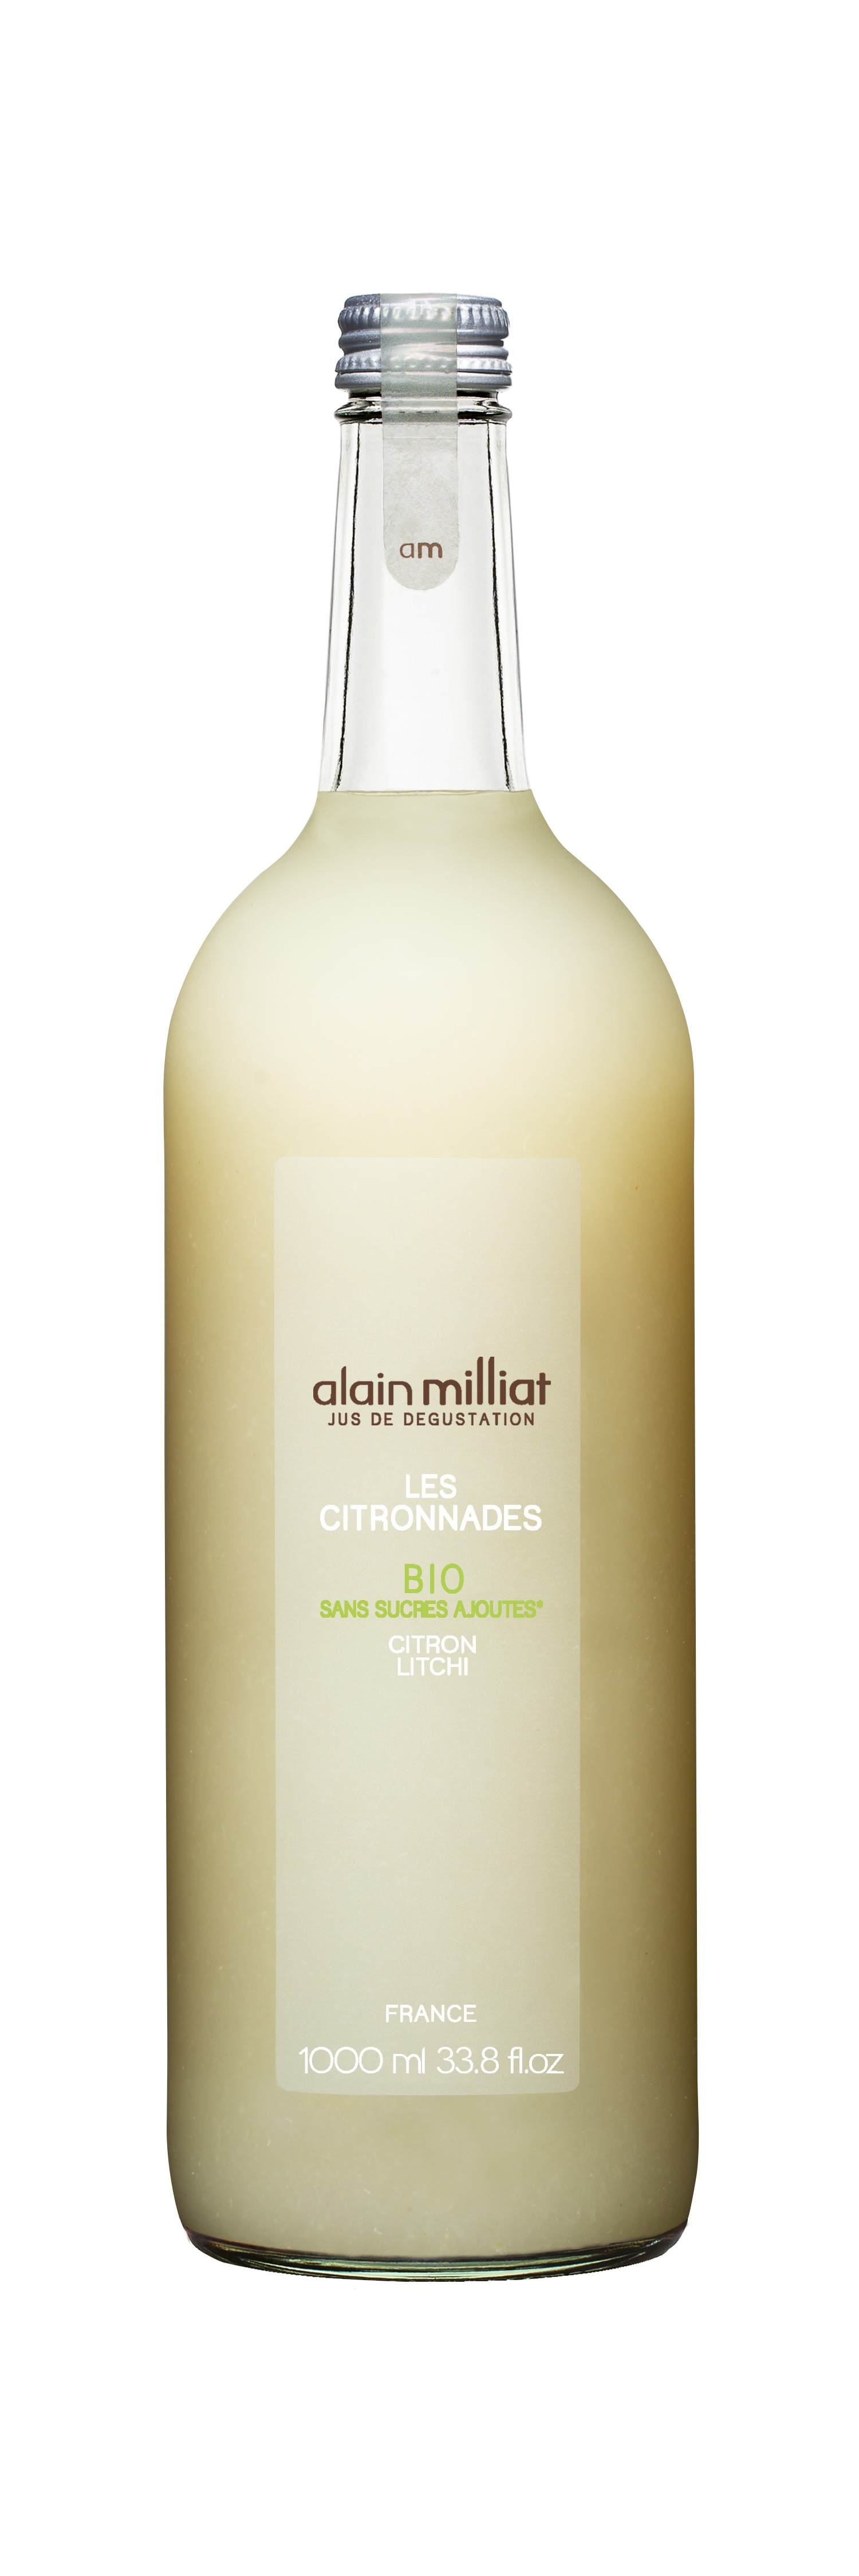 Citronnade Citron - Litchi BIO, Alain Milliat (1 L)